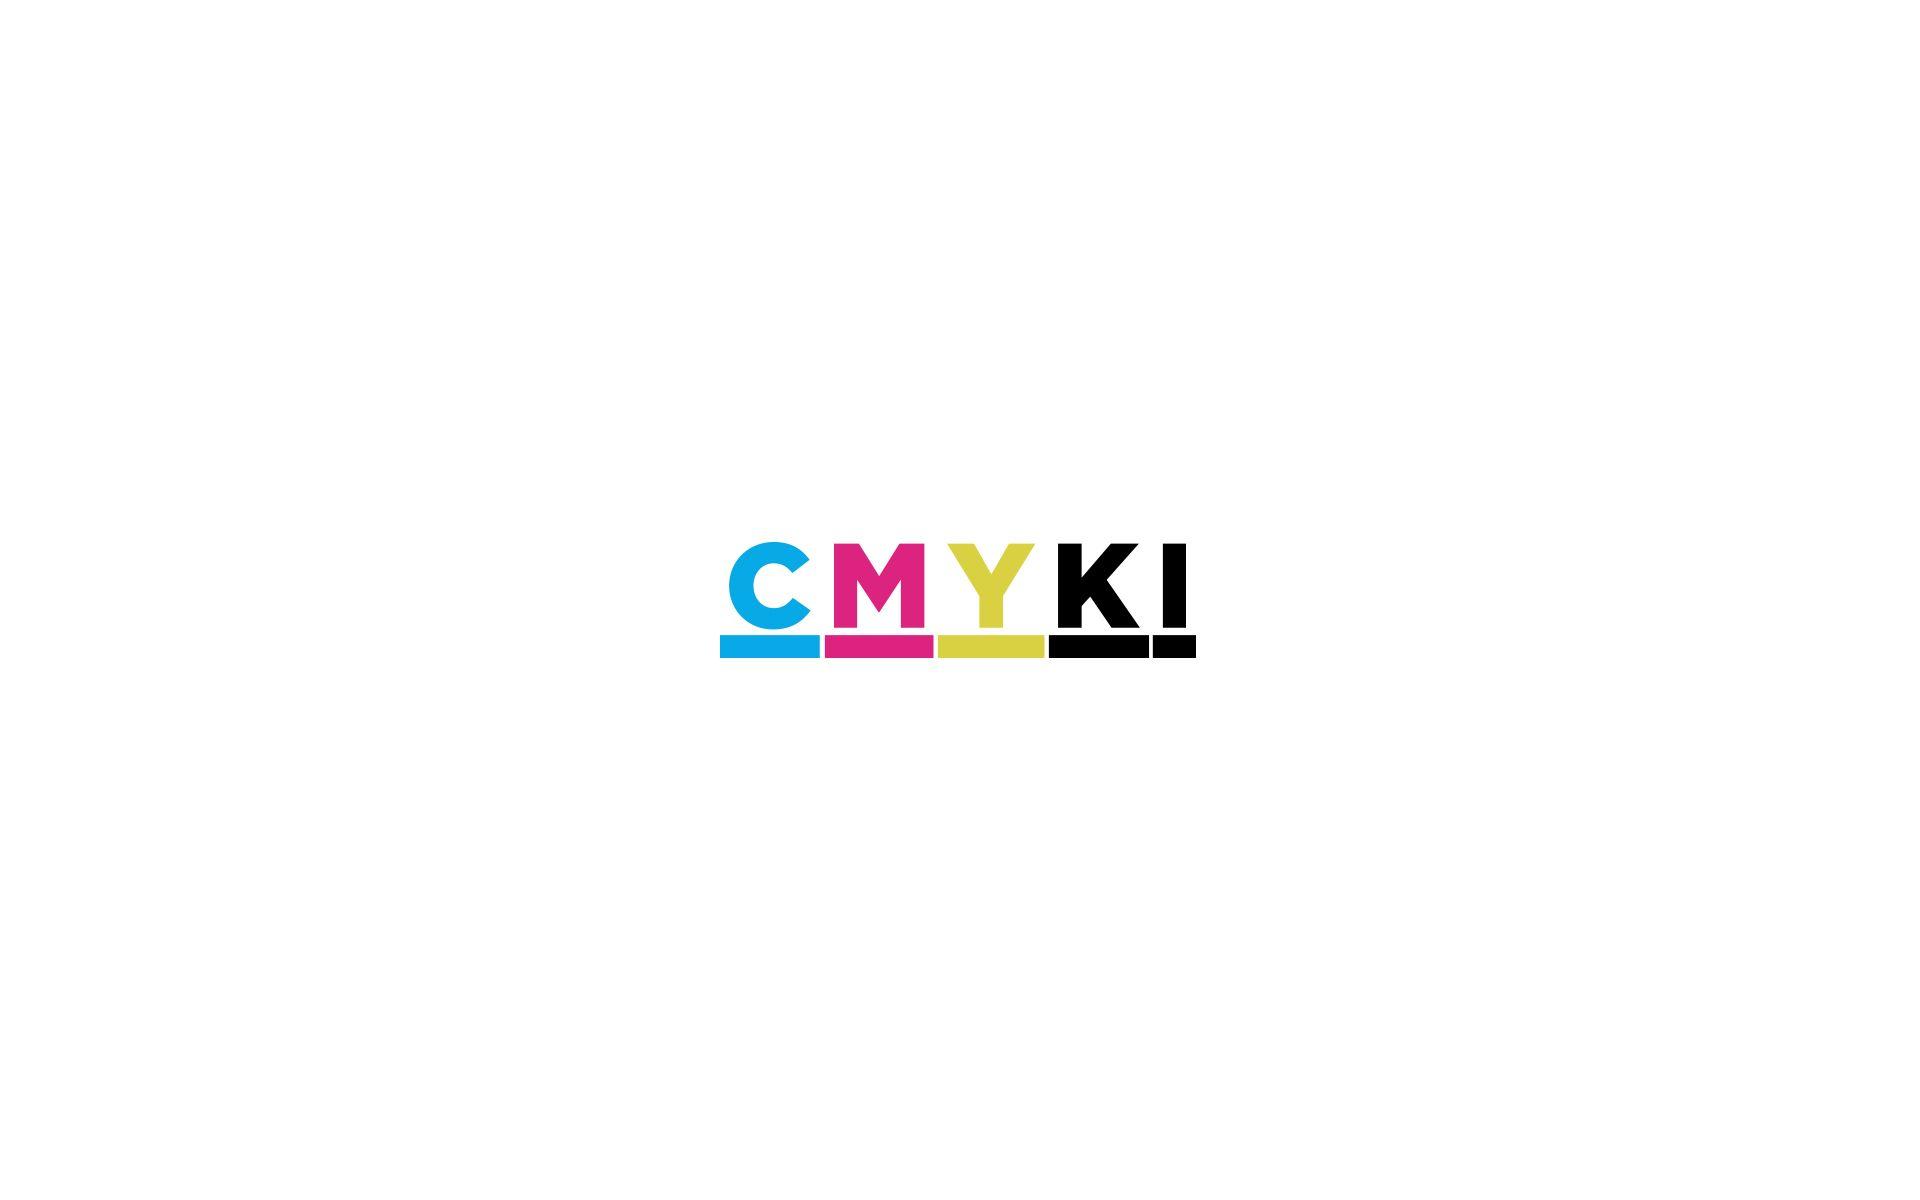 Логотип бренда-дистрибьютора картриджей - дизайнер U4po4mak